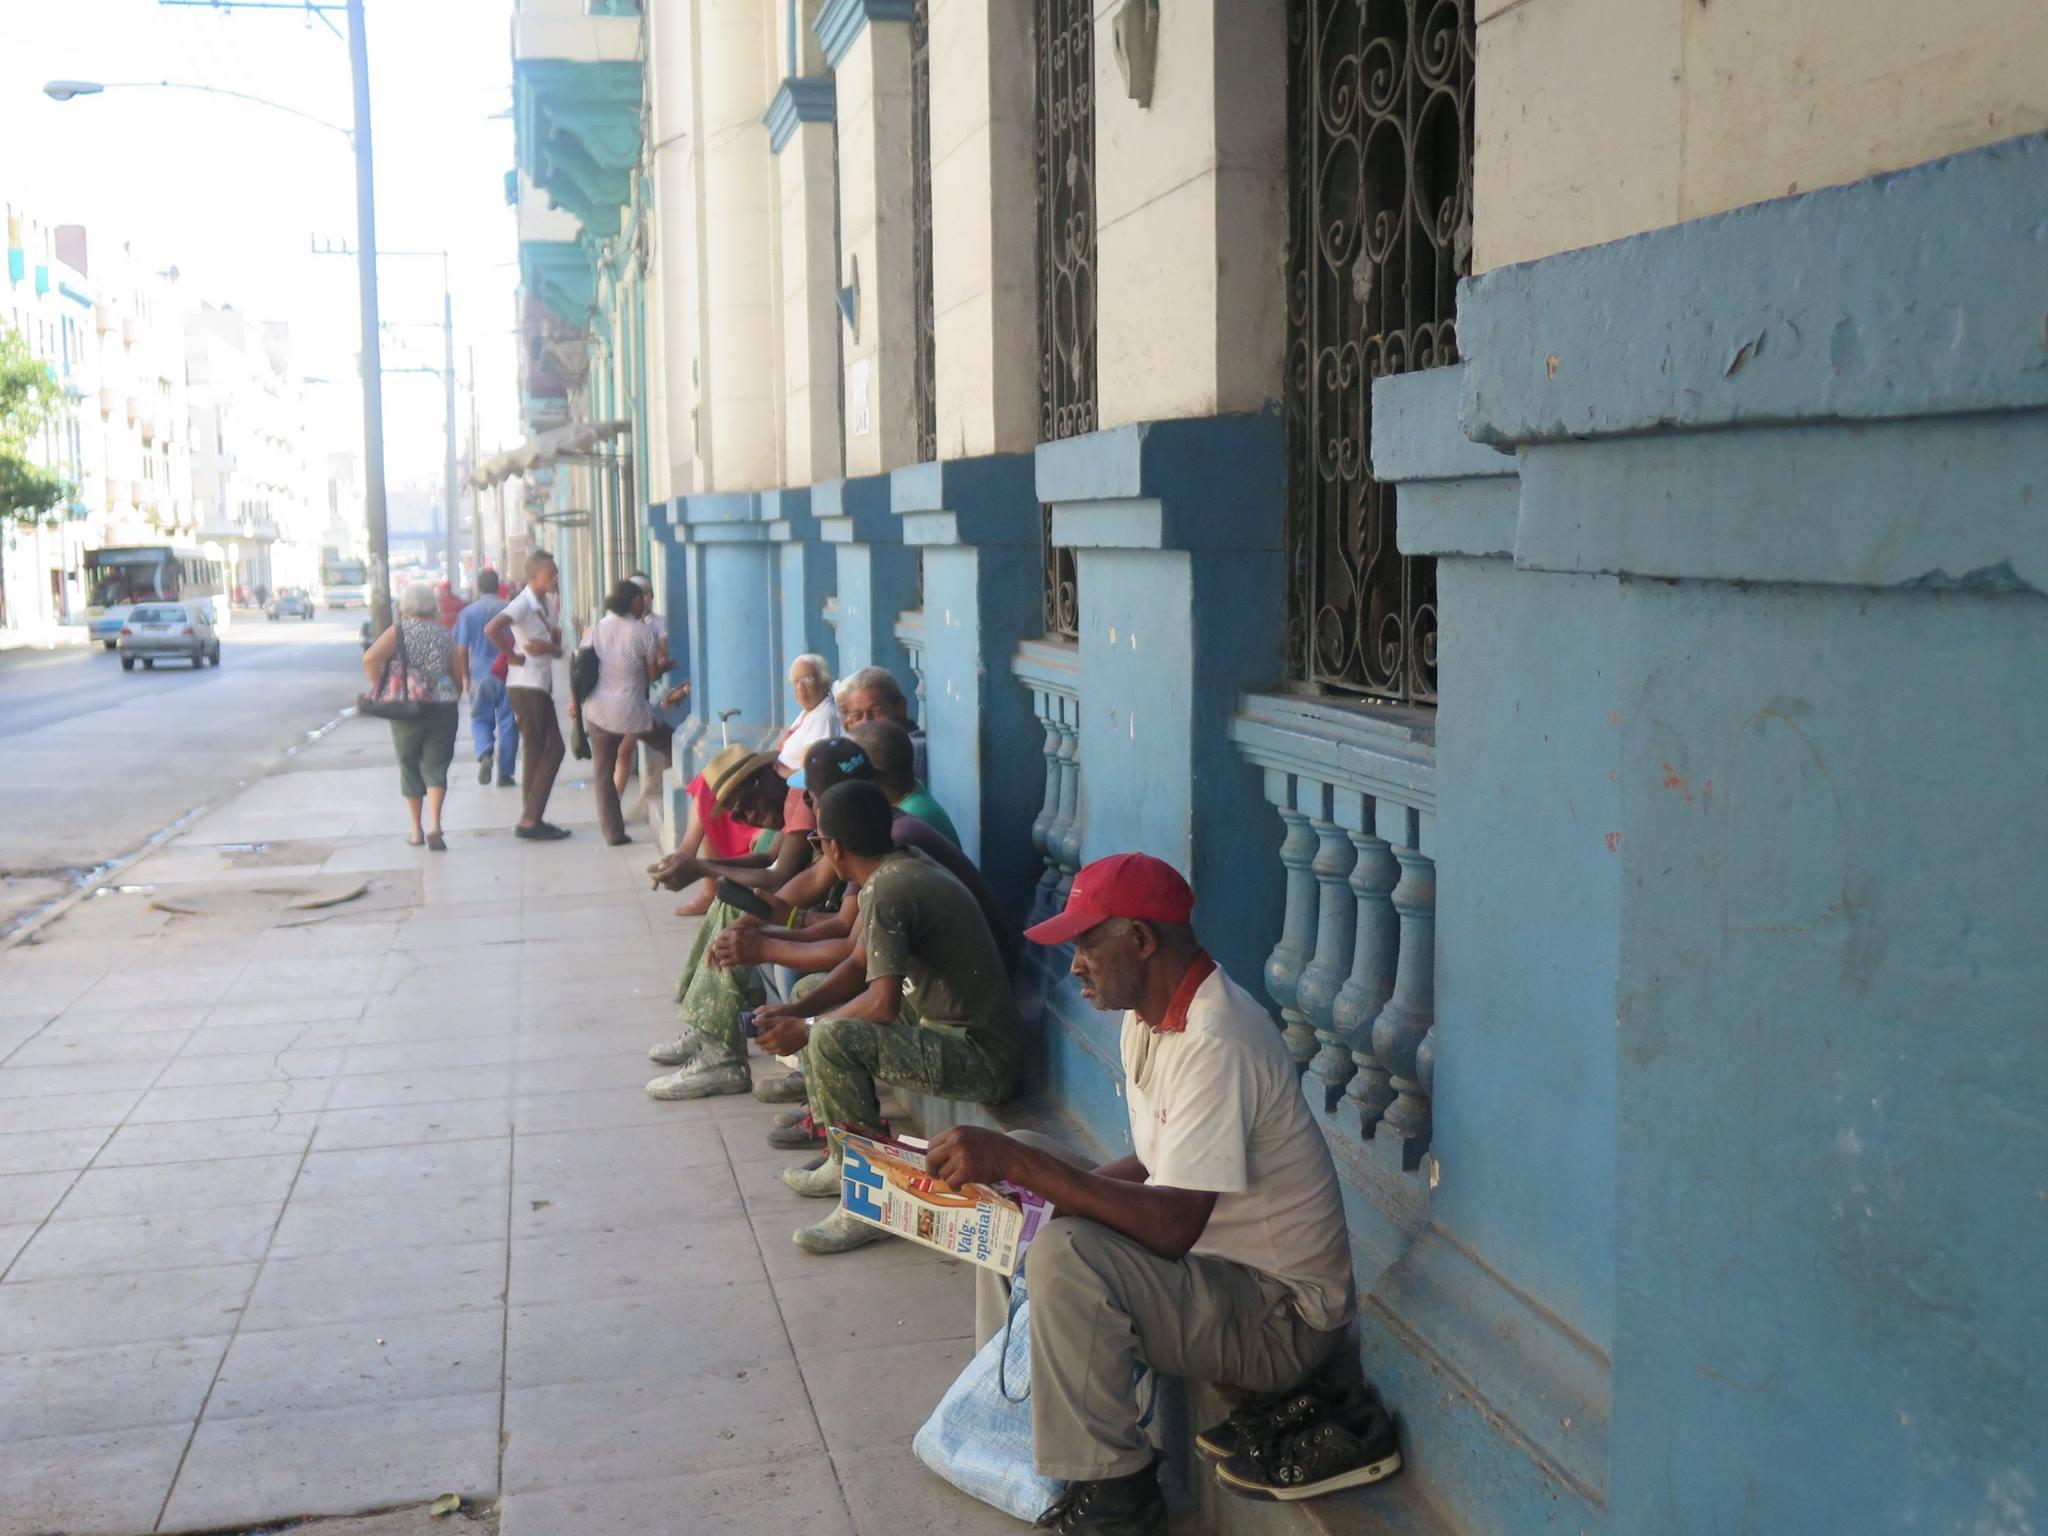 Cuba,havana,cuba havana,caribbean,island,latin,latin america,havana cuba,men,chess,men playing chess,havana street,street,streetlife, people, residents, locals, street lime, hanging out, hang out in havana, centro havana,